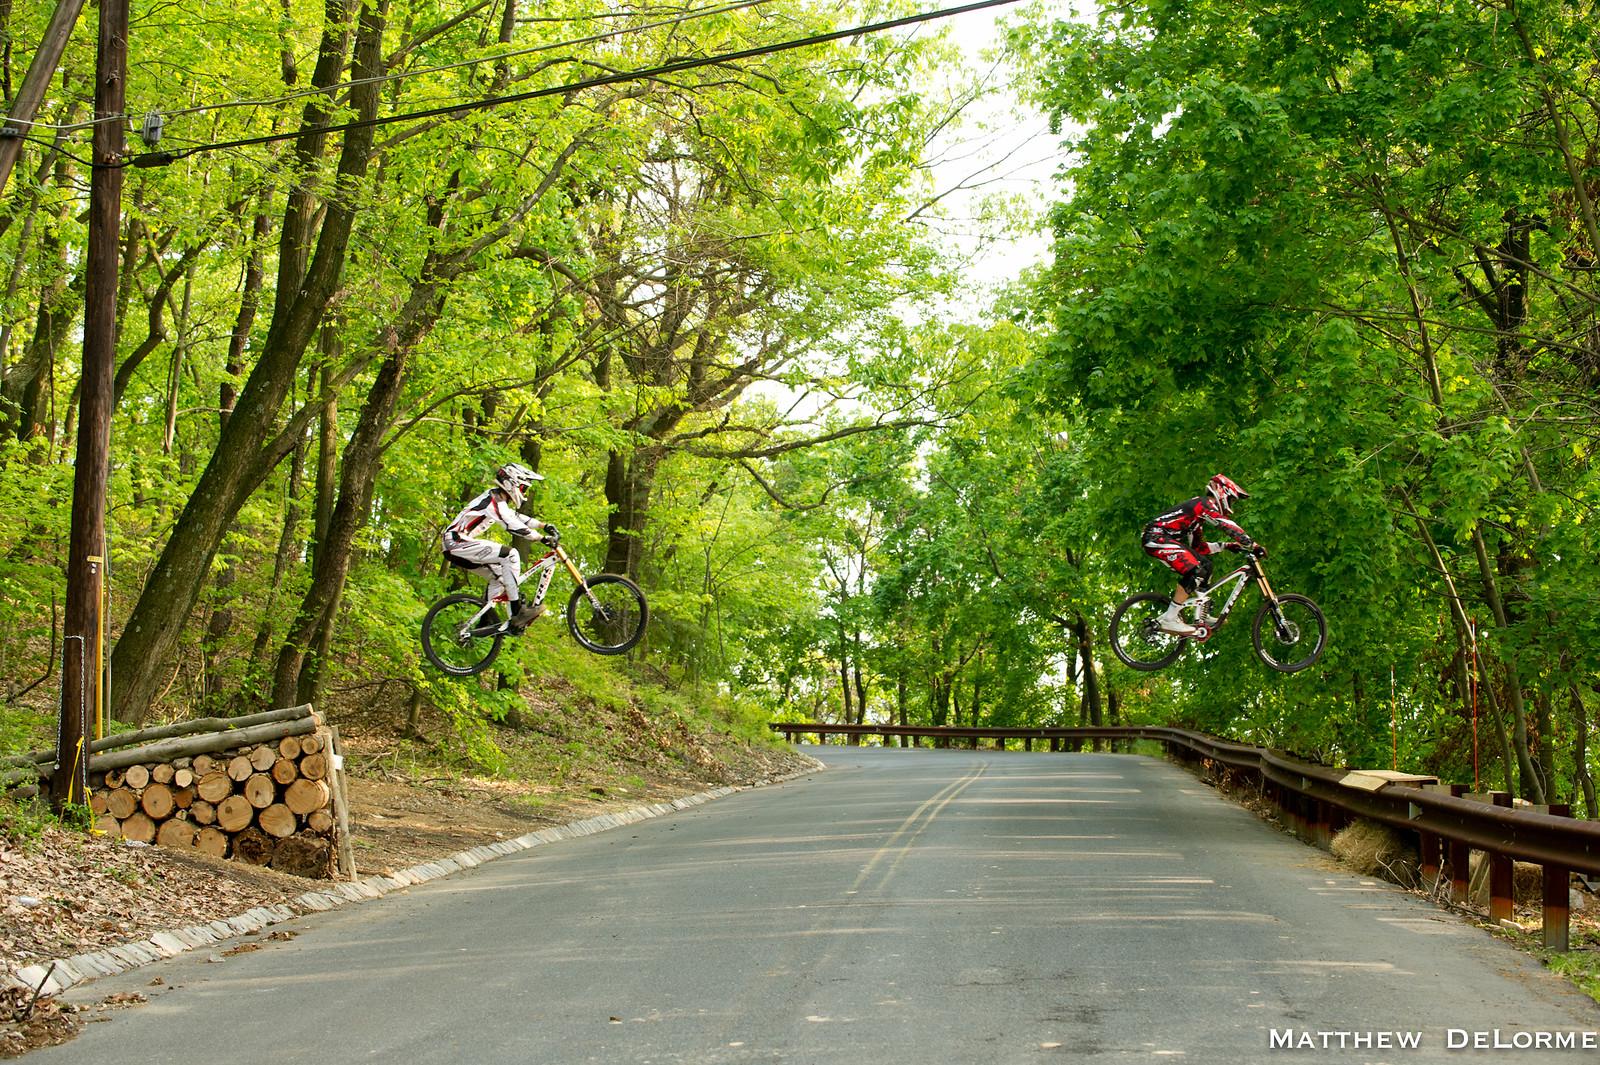 Road Gap  - mdelorme - Mountain Biking Pictures - Vital MTB